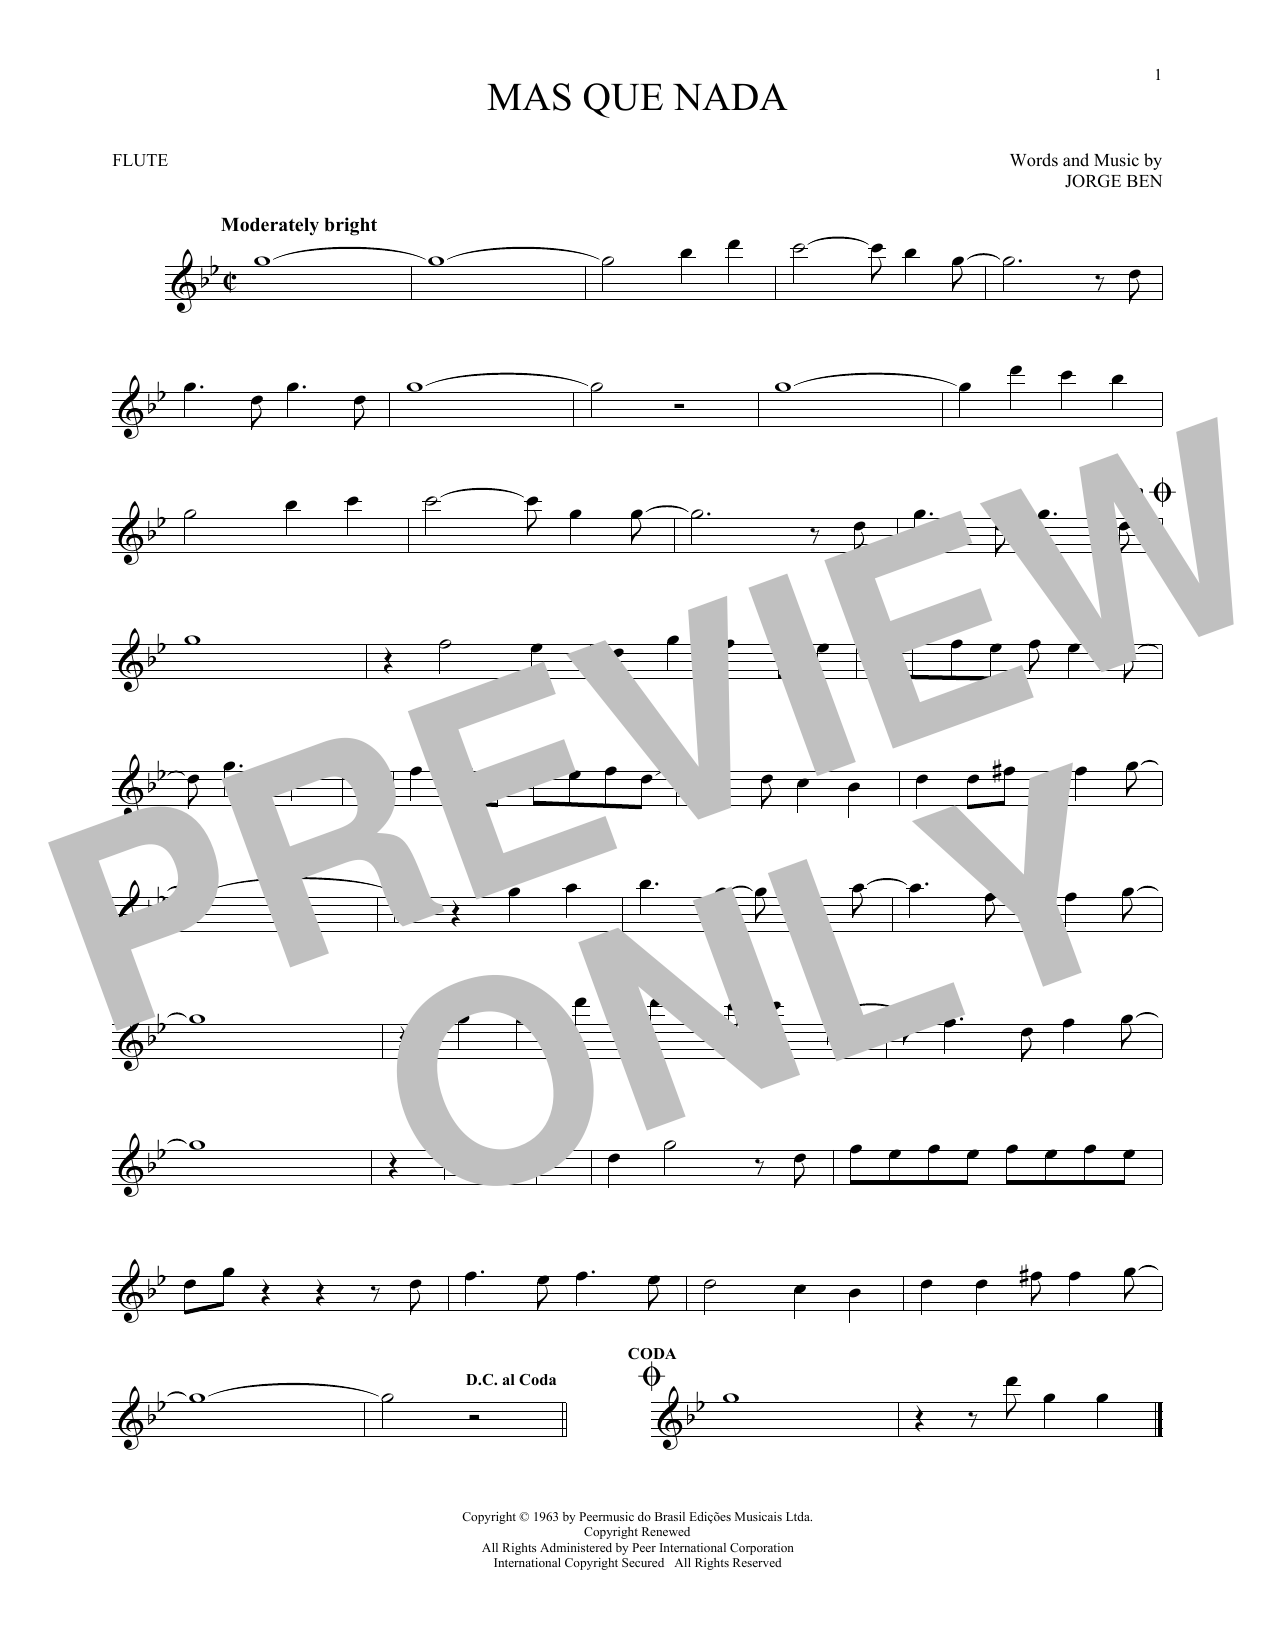 Mas Que Nada (Flute Solo)